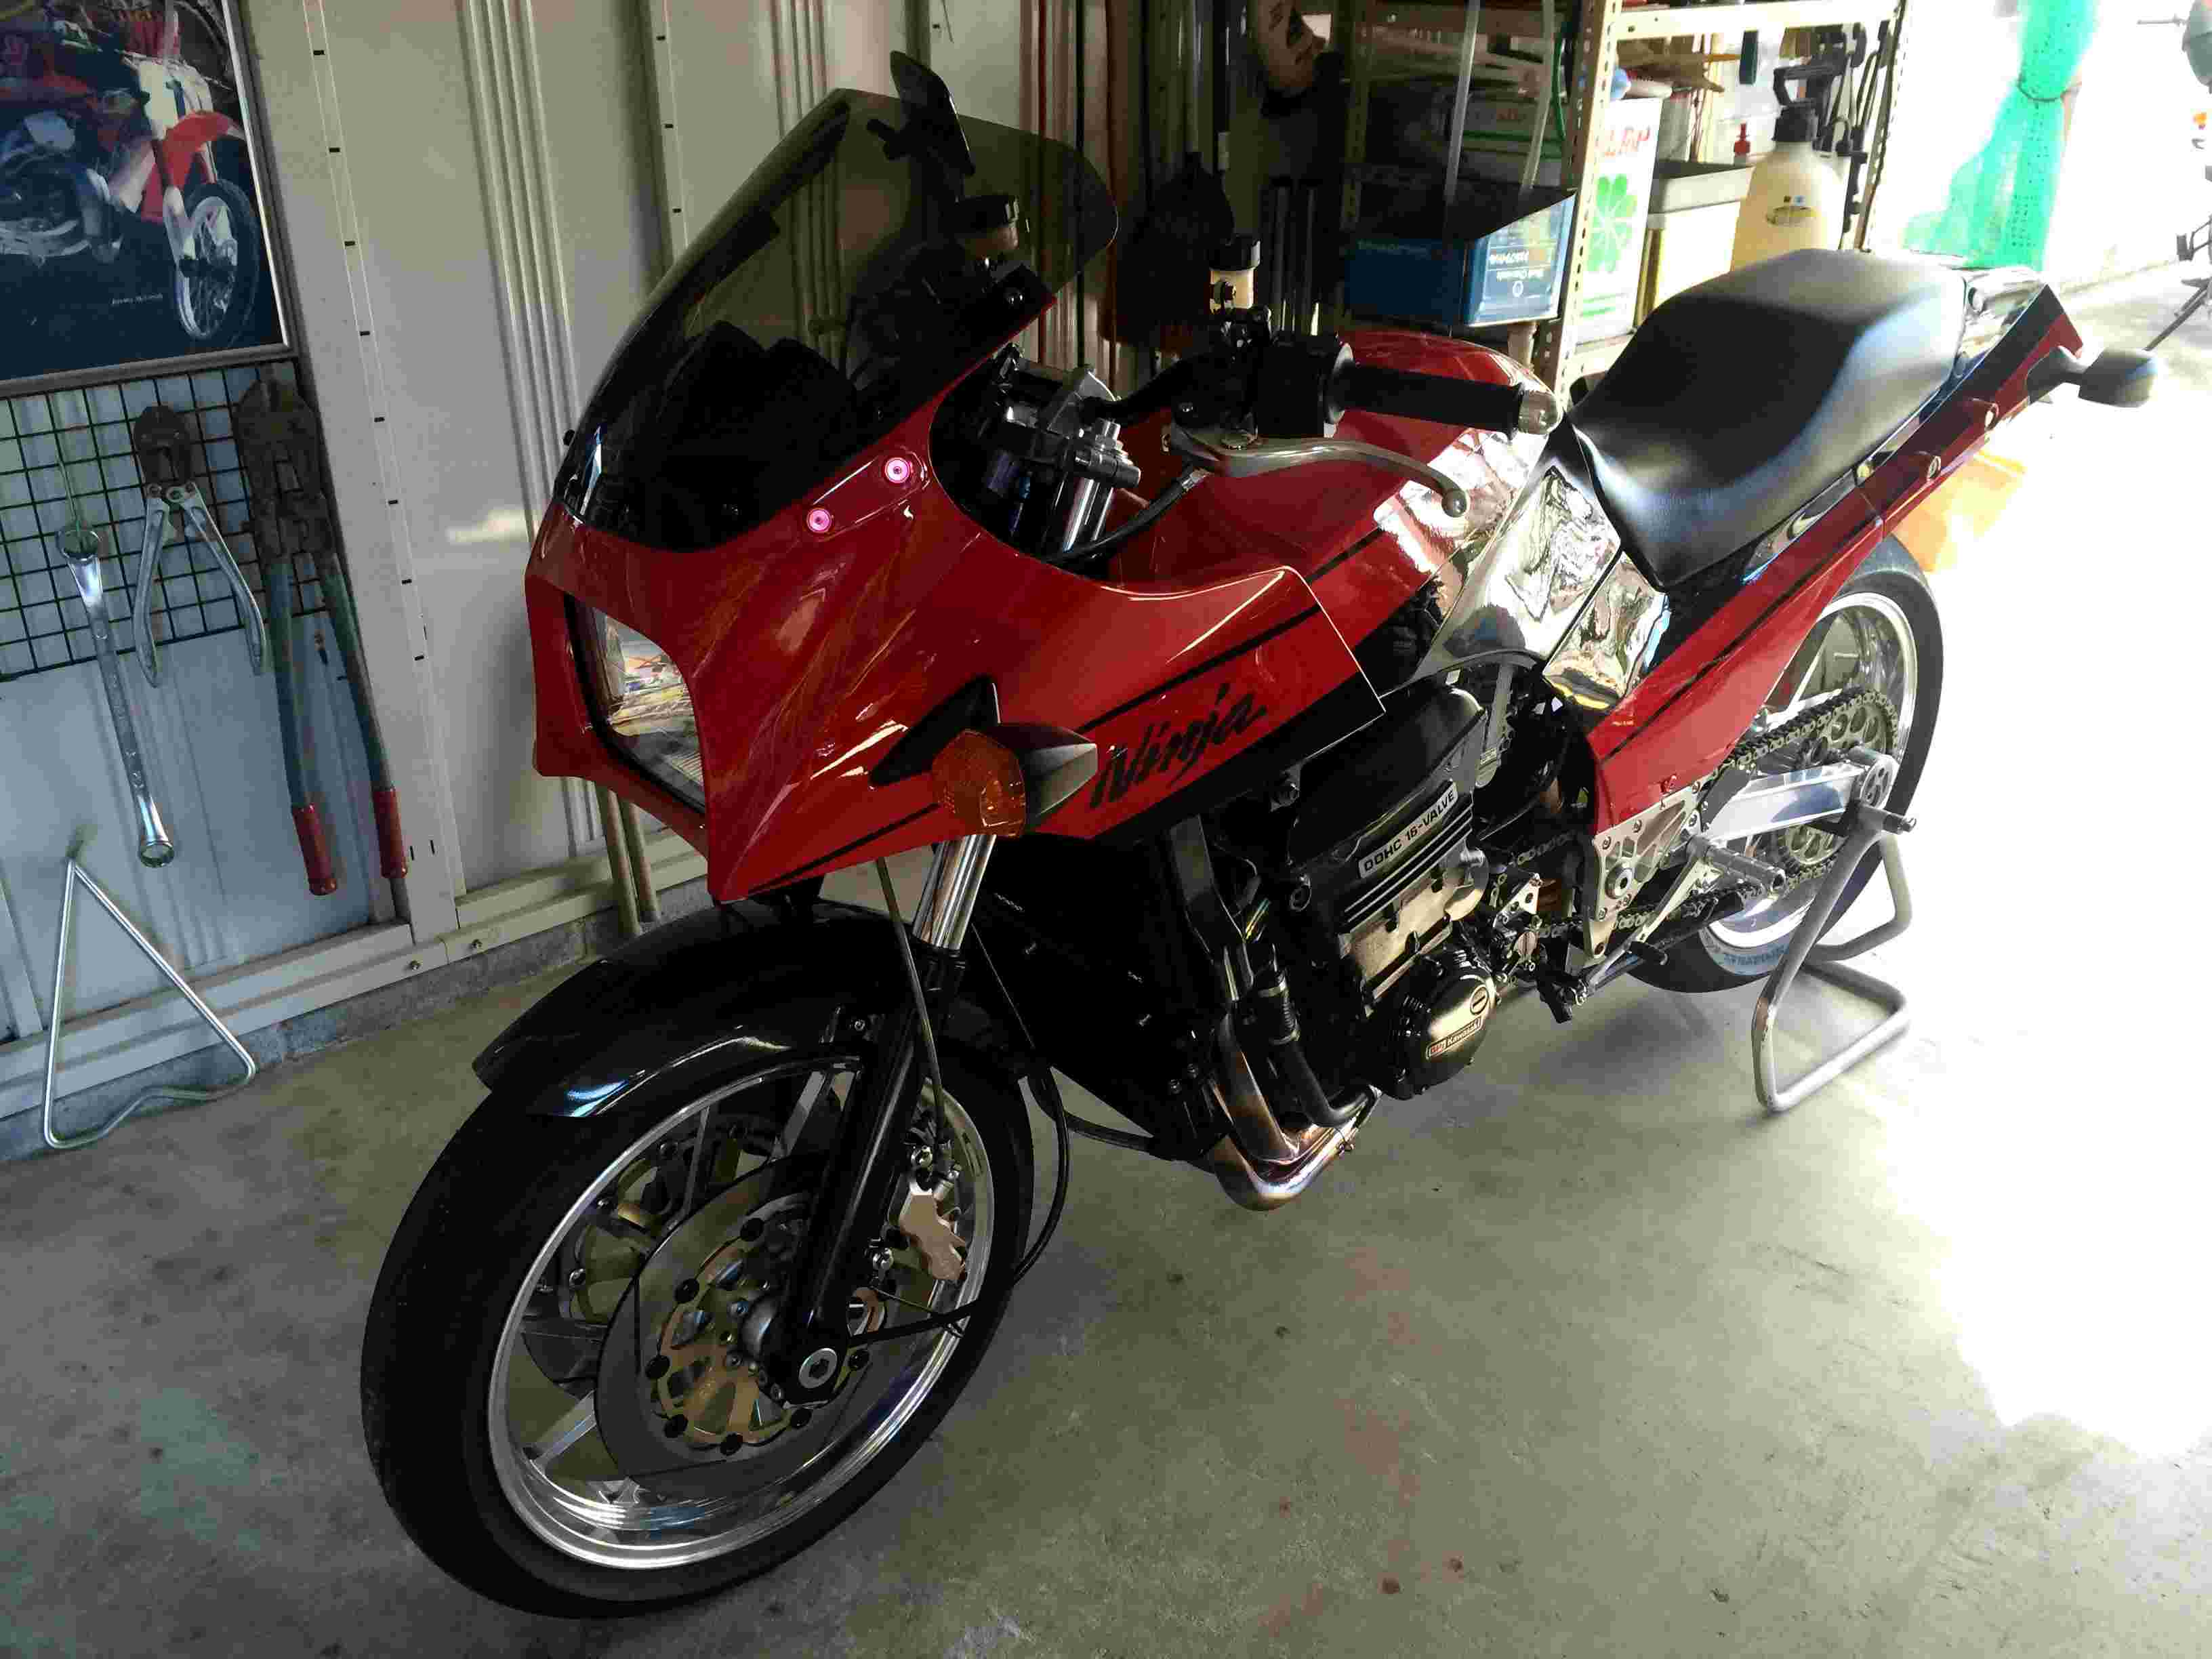 Kawasaki GPZ-R 900 et 750, 1000 RX, ZX 10 TOMCAT - Page 7 Img_4710